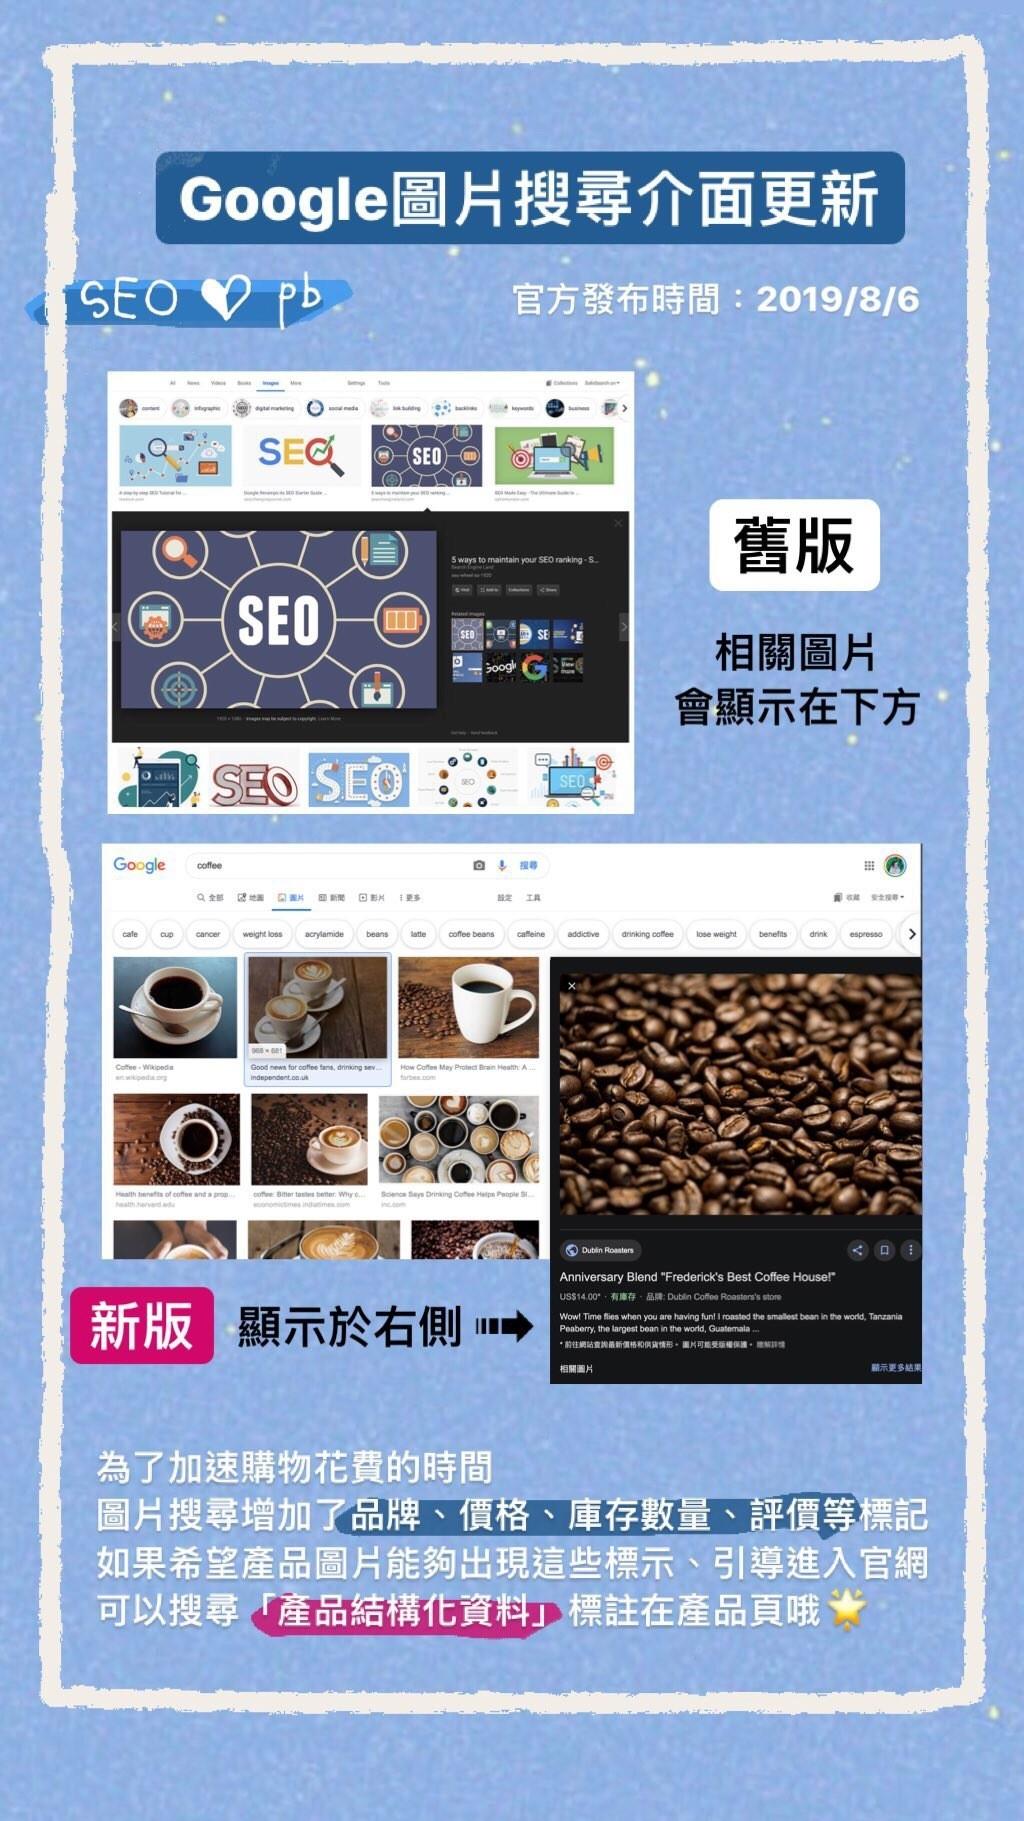 Google圖片搜尋介面更新 seo_pb Instagram